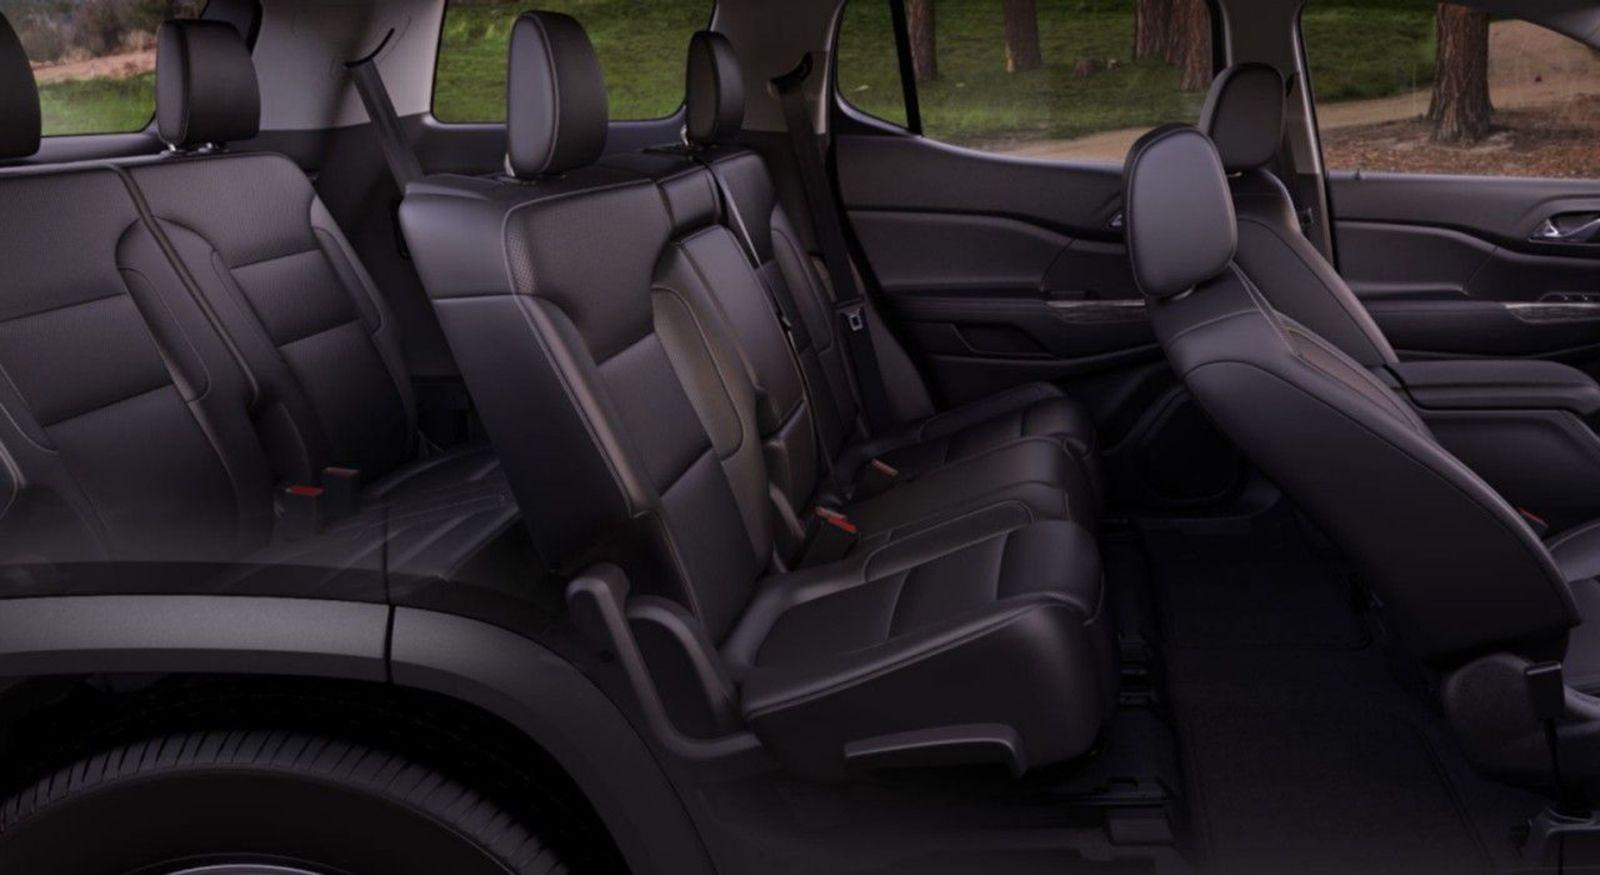 dan tobin buick gmc is a columbus buick gmc dealer and a autos post. Black Bedroom Furniture Sets. Home Design Ideas